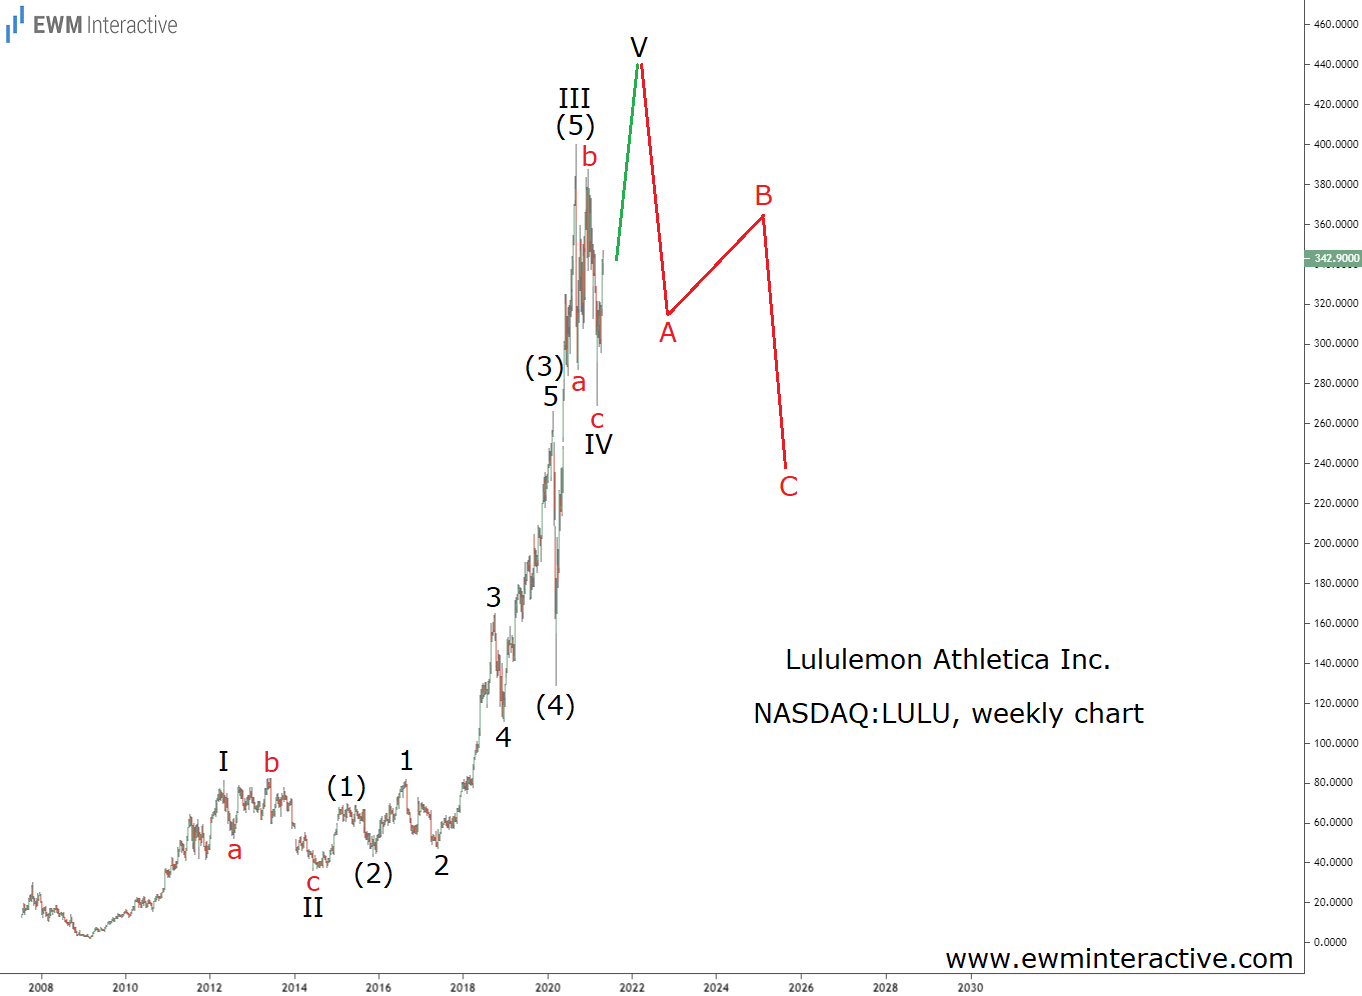 Lululemon Stock to form a bearish Elliott Wave reversal near $450